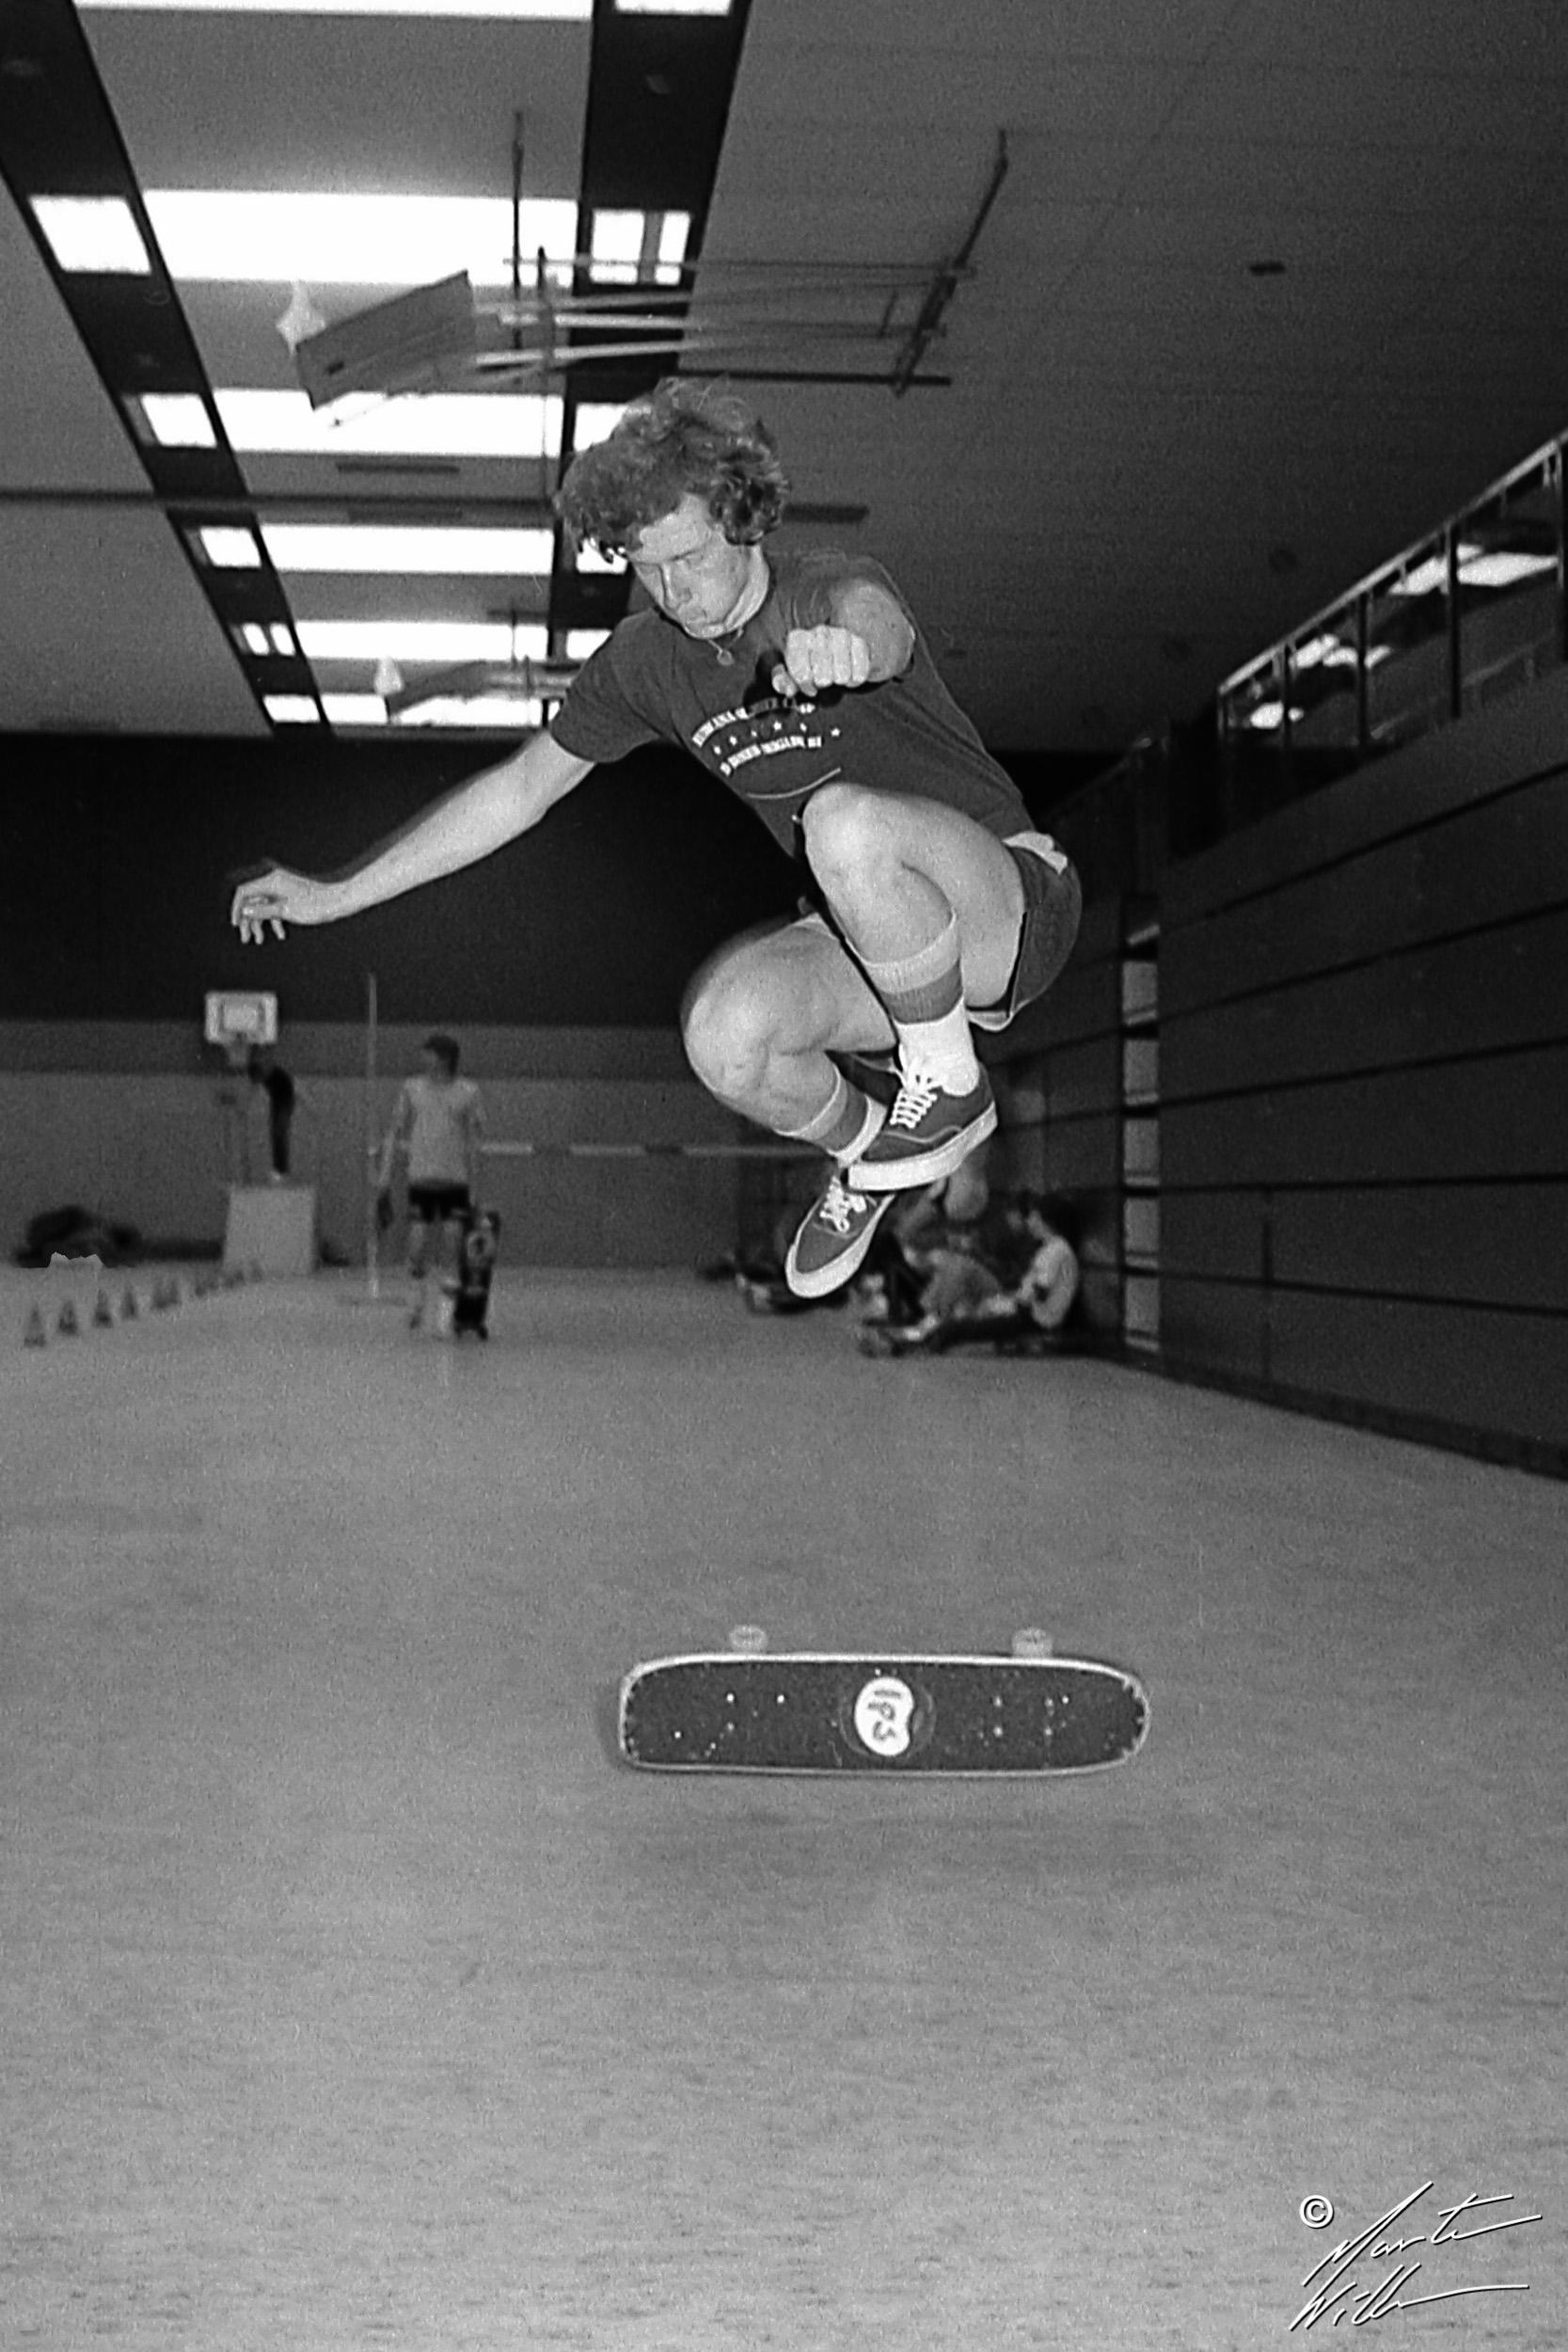 Shane Rouse, Railflip, Tyskland 1982